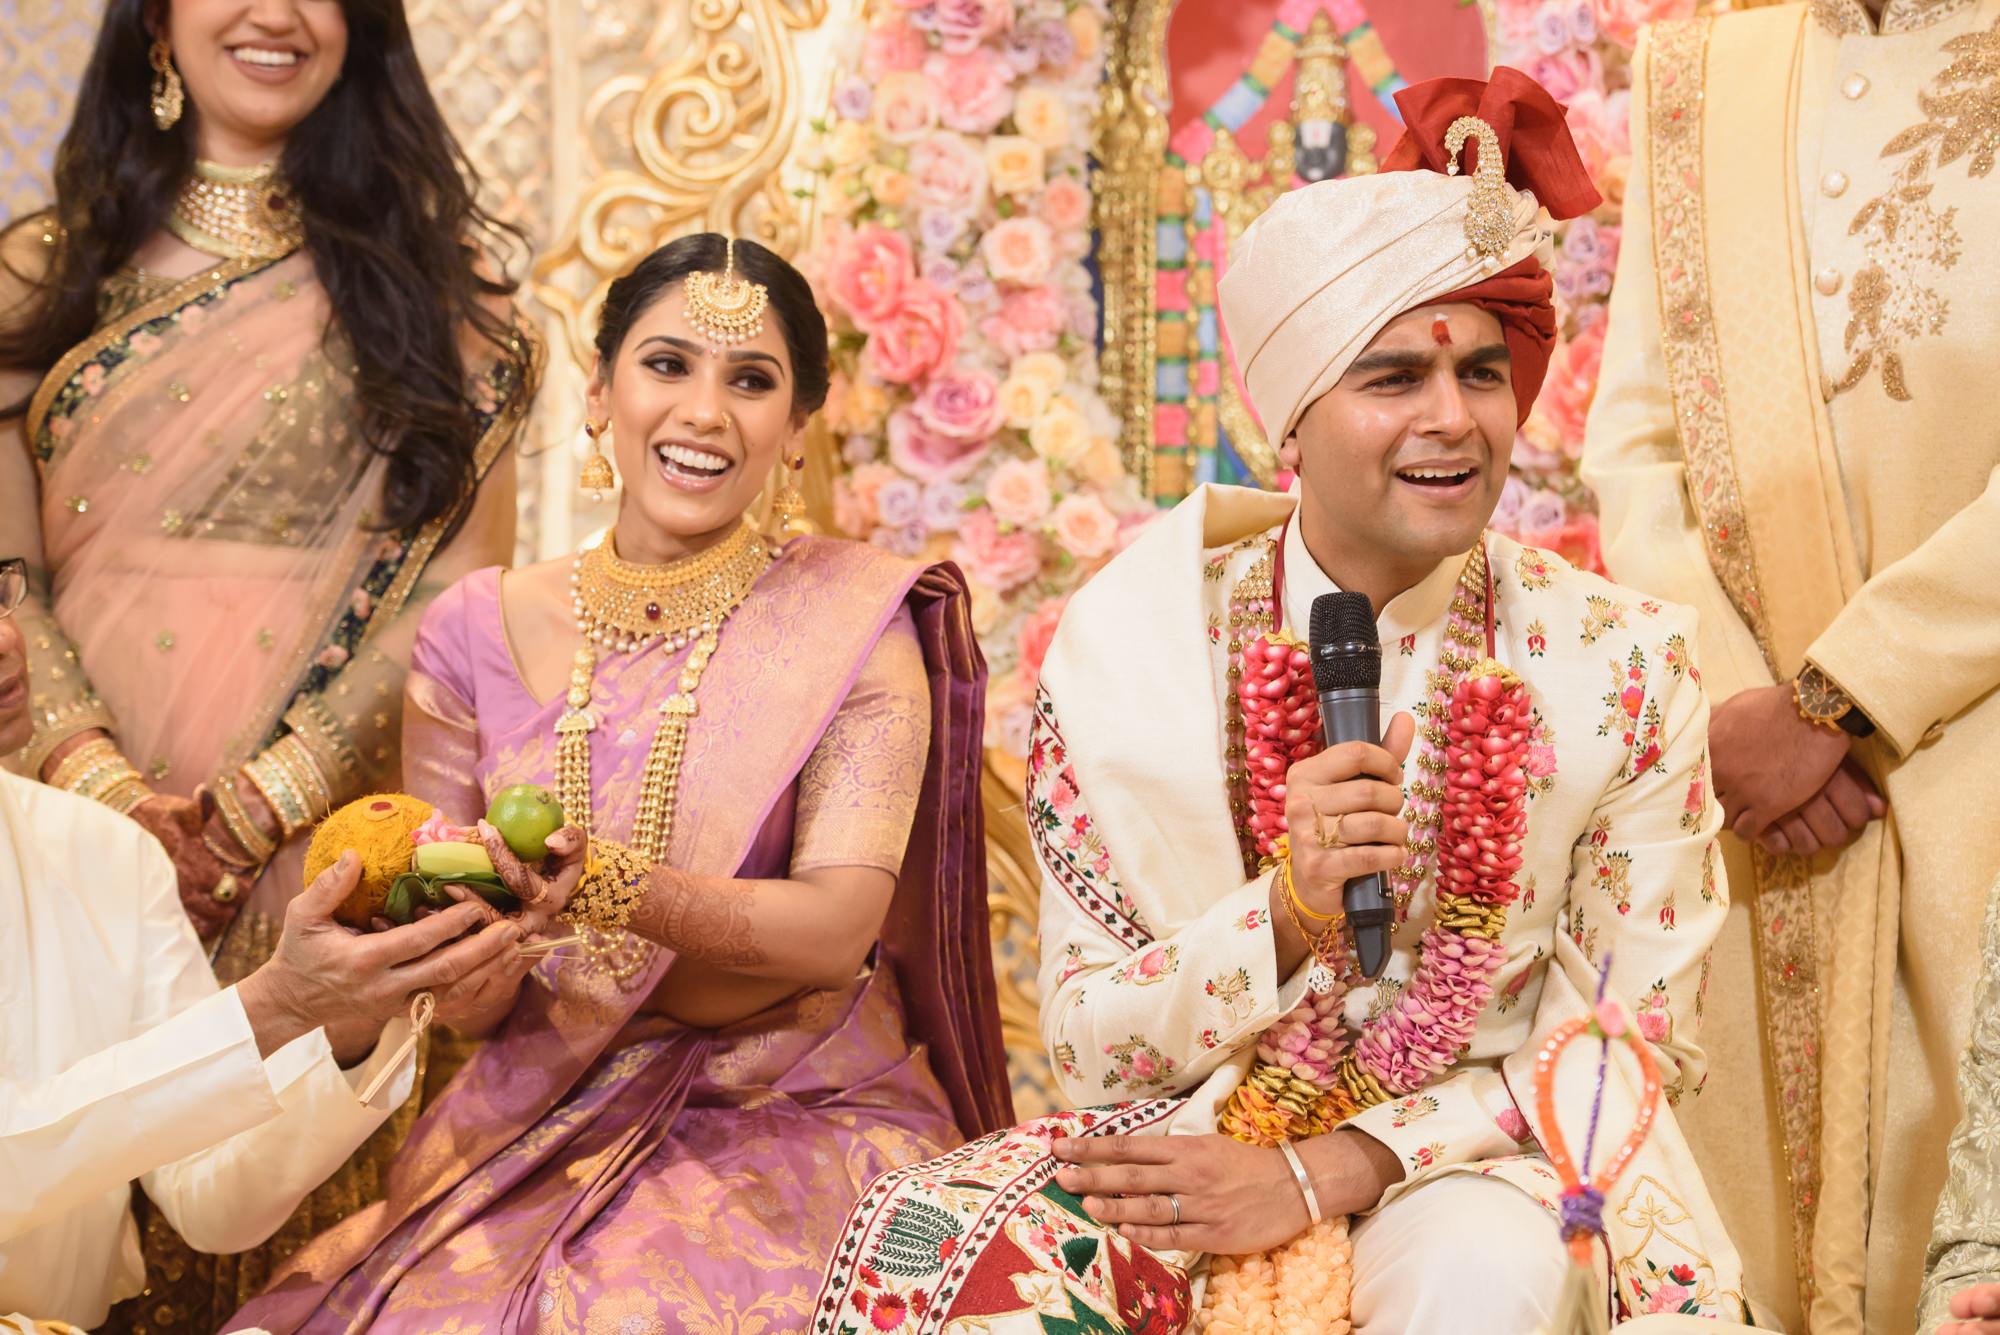 Tamil Gujrati hindu wedding photography photographer london the savoy -46.jpg